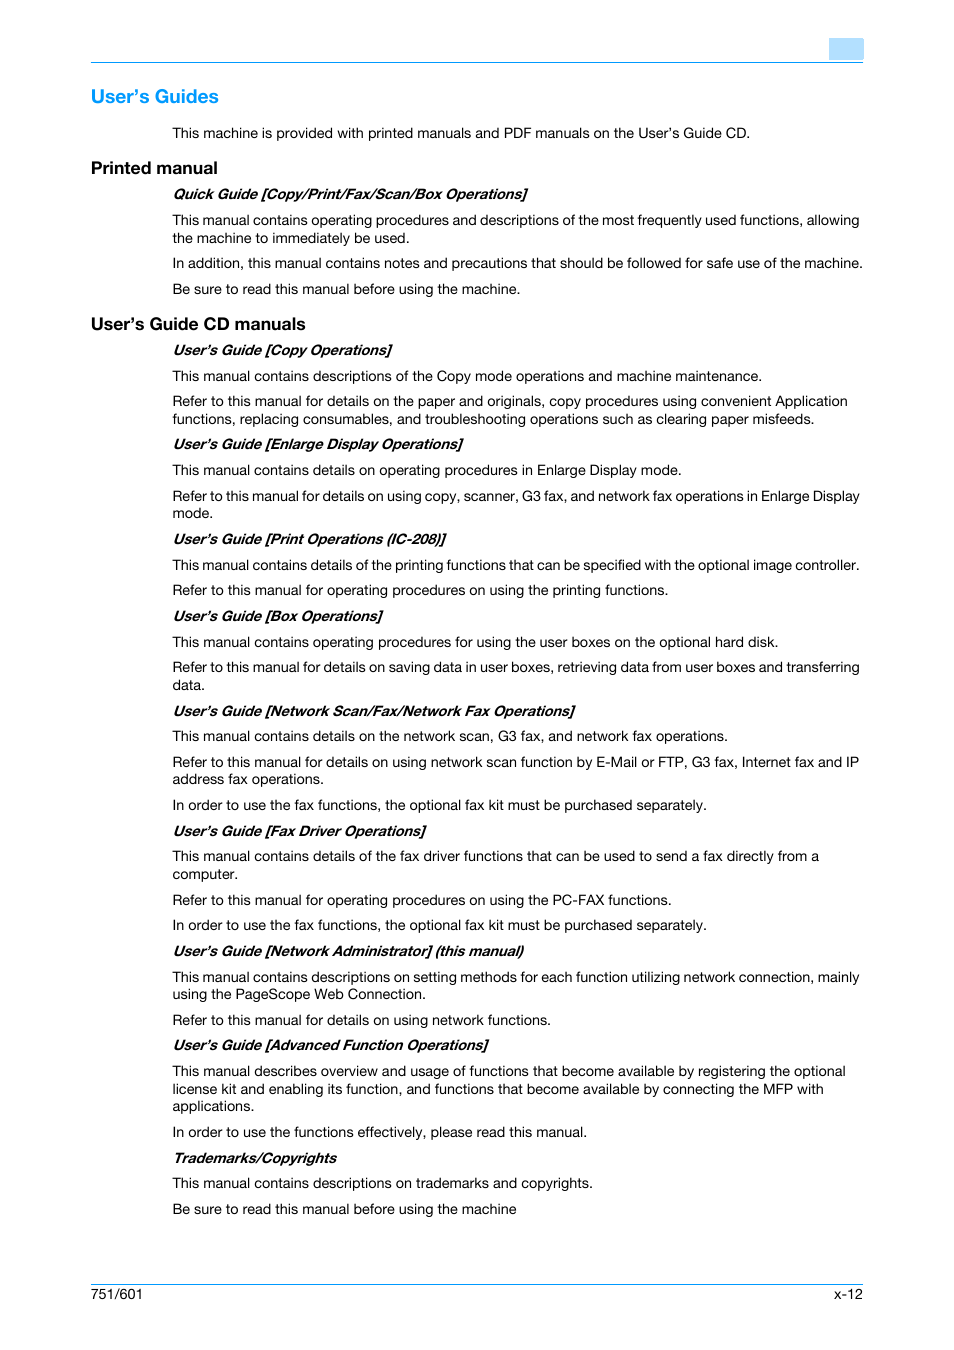 User's guides, Printed manual, User's guide cd manuals | Konica Minolta  bizhub 601 User